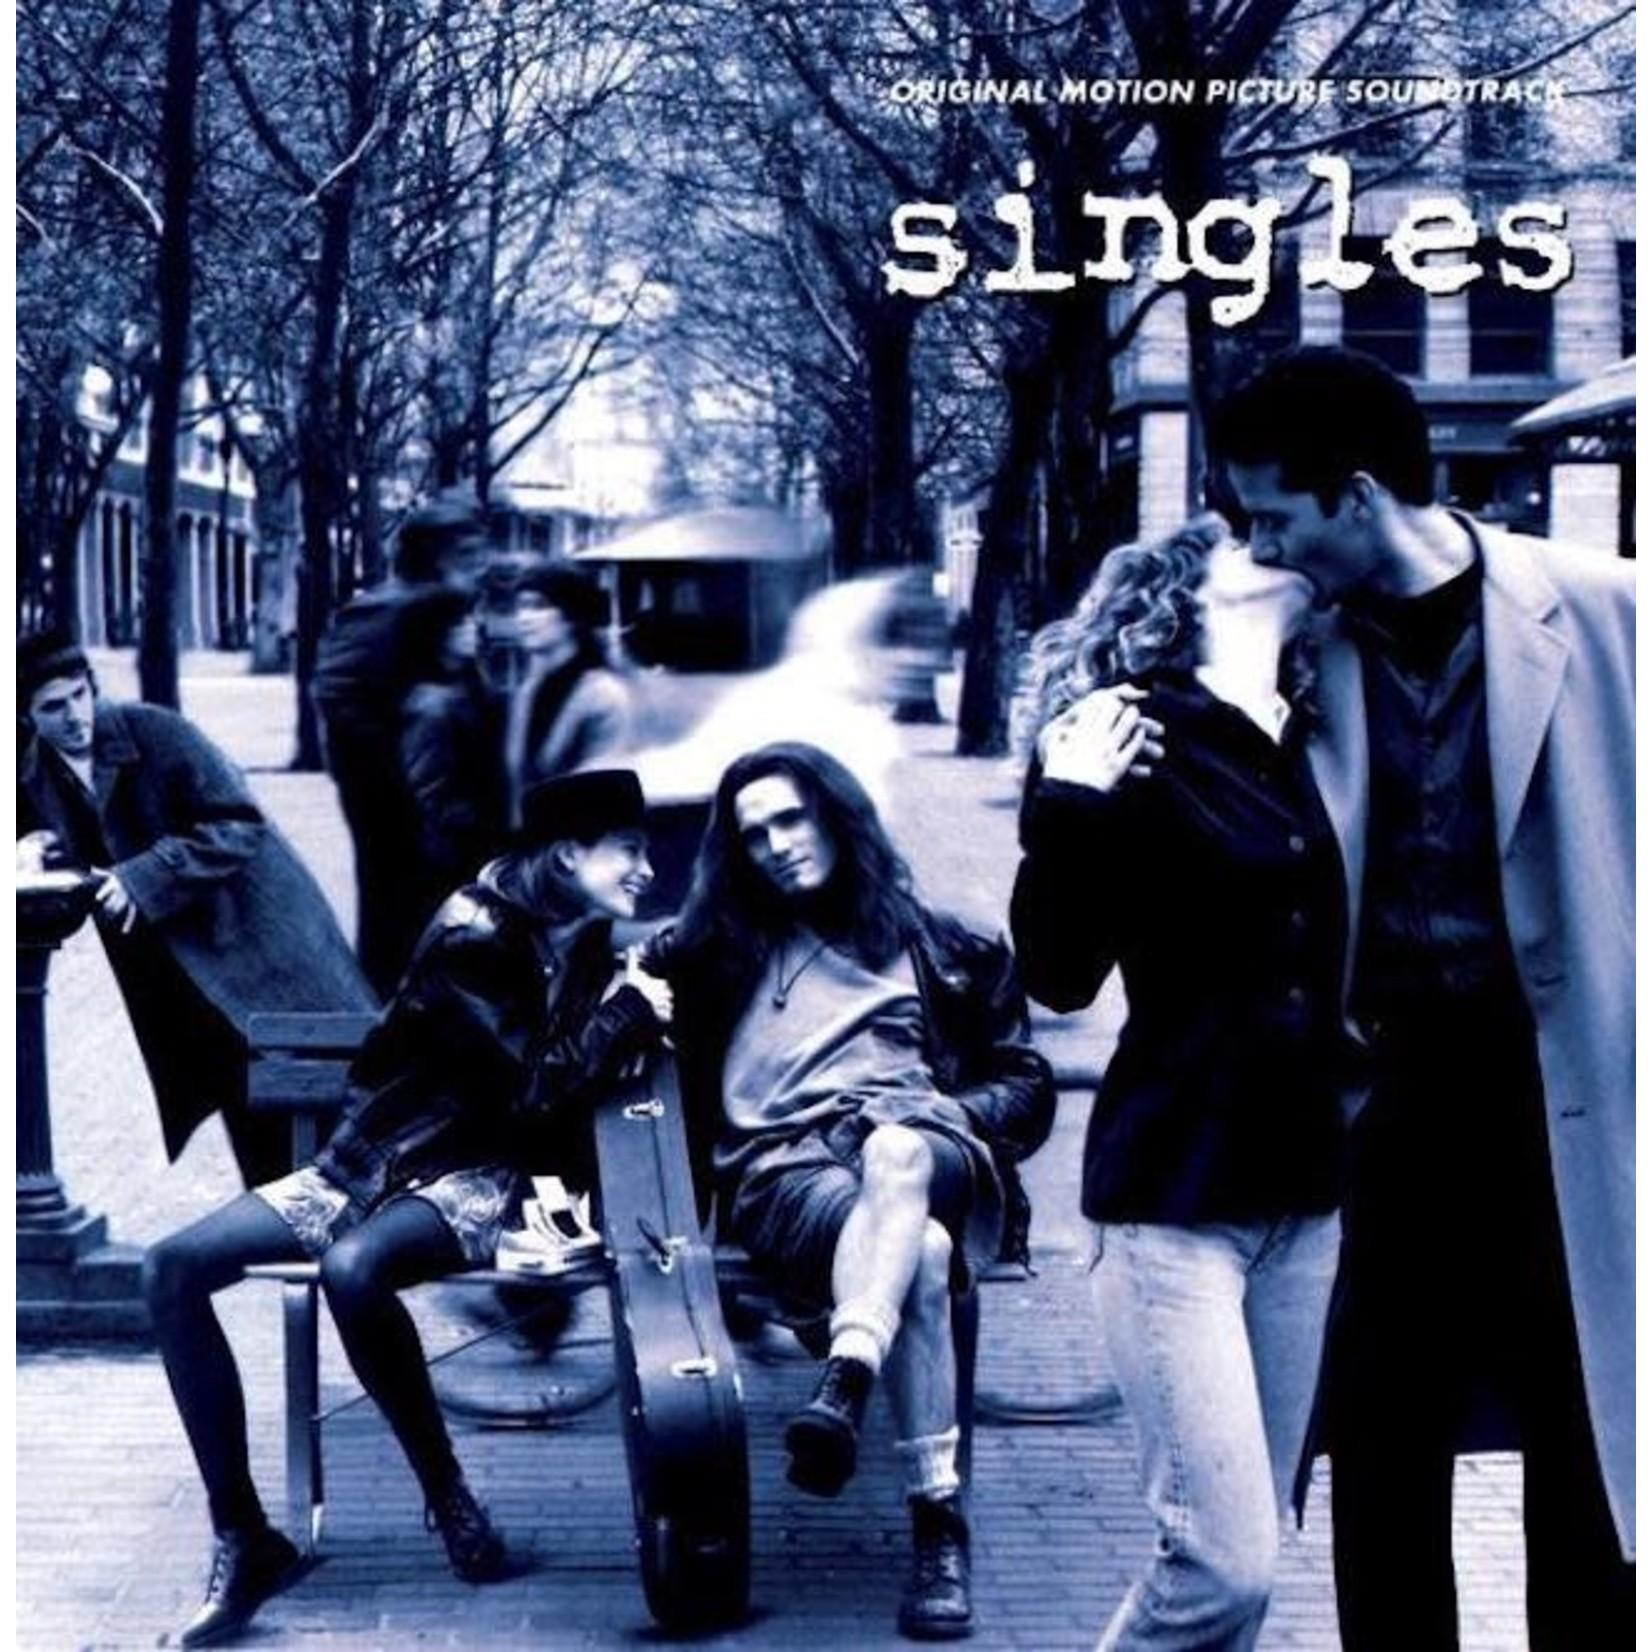 [New] Various: Singles (soundtrack) (2LP+CD)